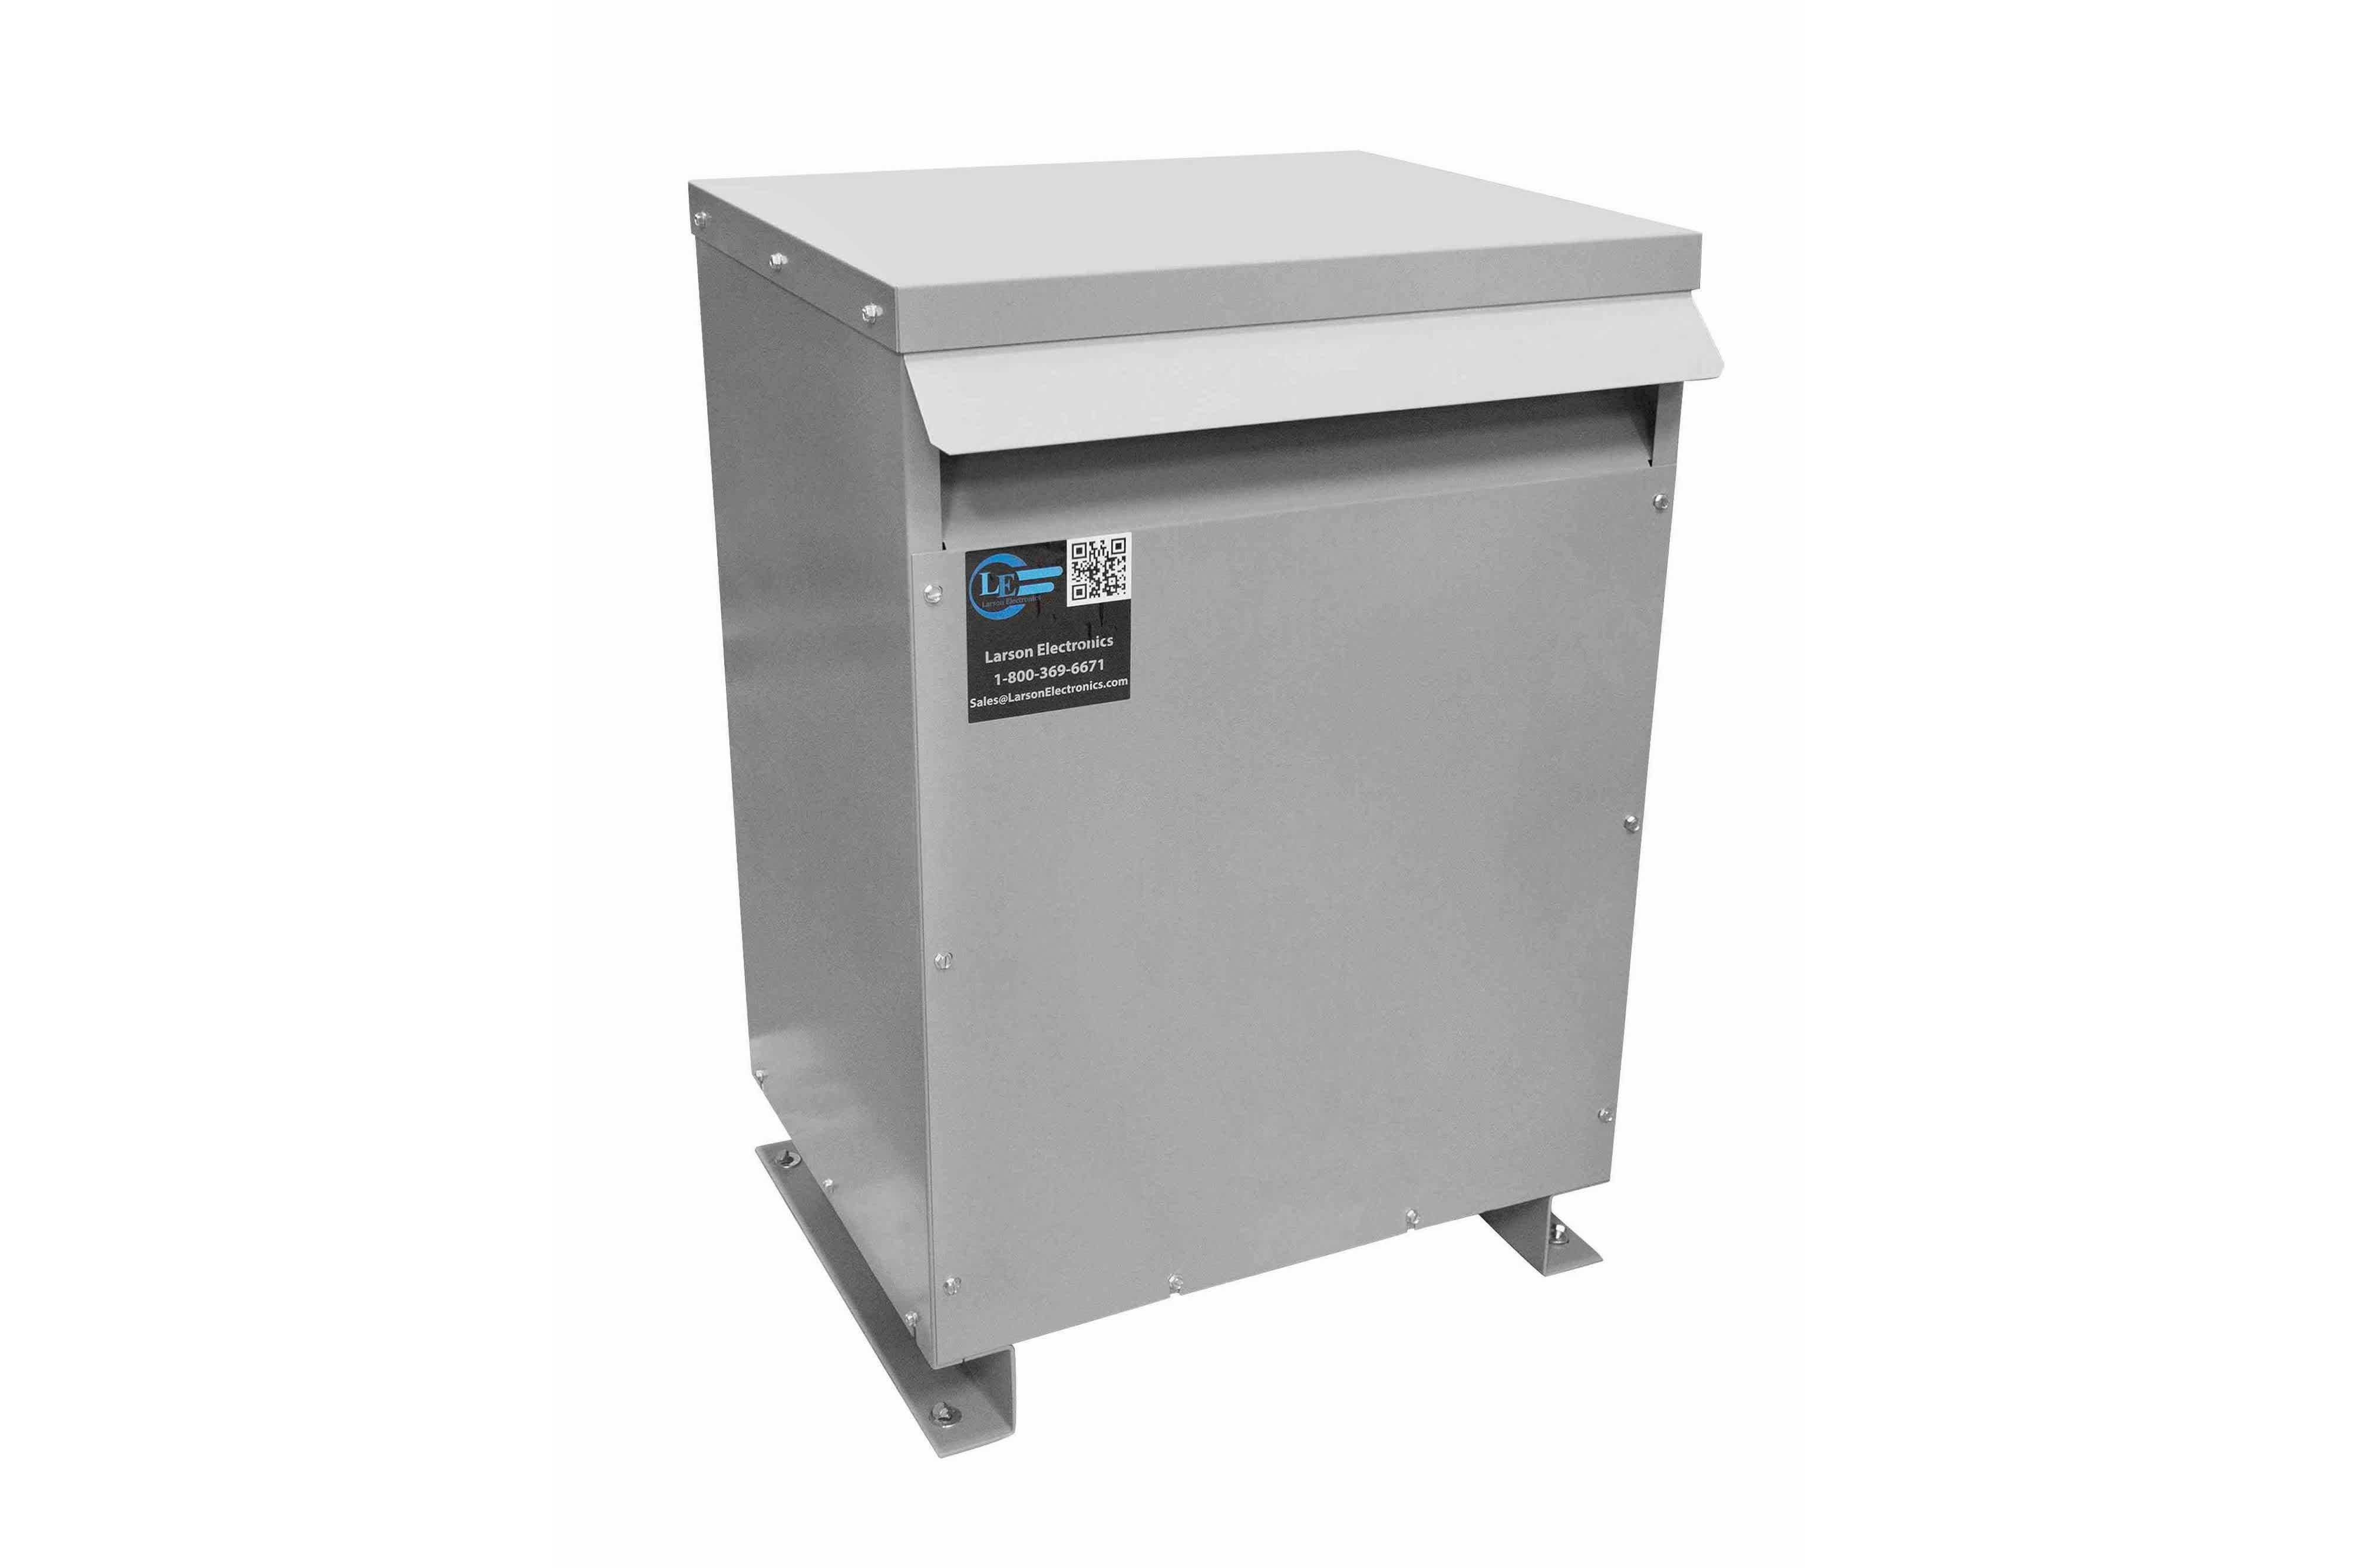 50 kVA 3PH Isolation Transformer, 230V Wye Primary, 208Y/120 Wye-N Secondary, N3R, Ventilated, 60 Hz